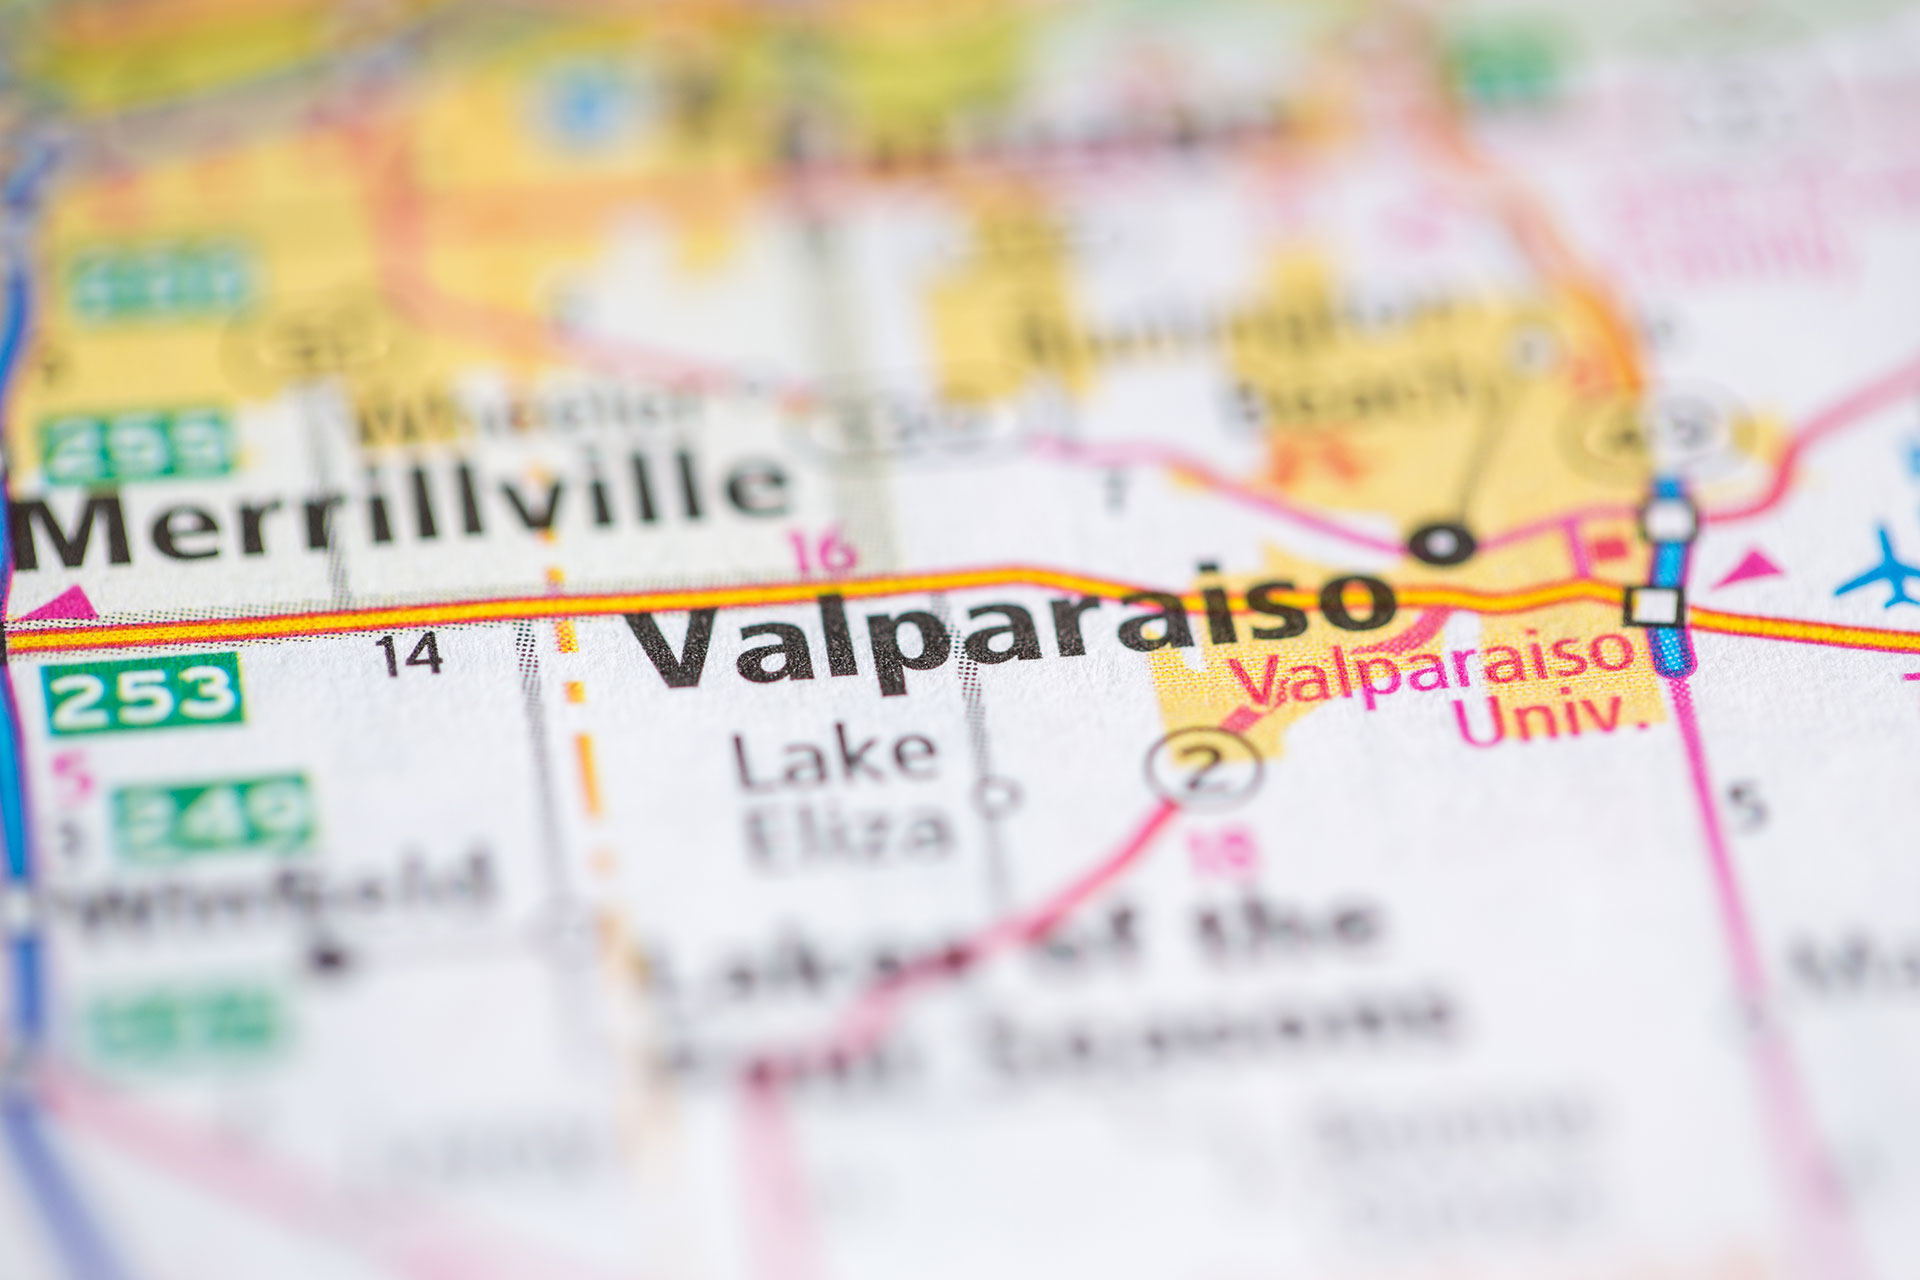 Image of Valparaiso